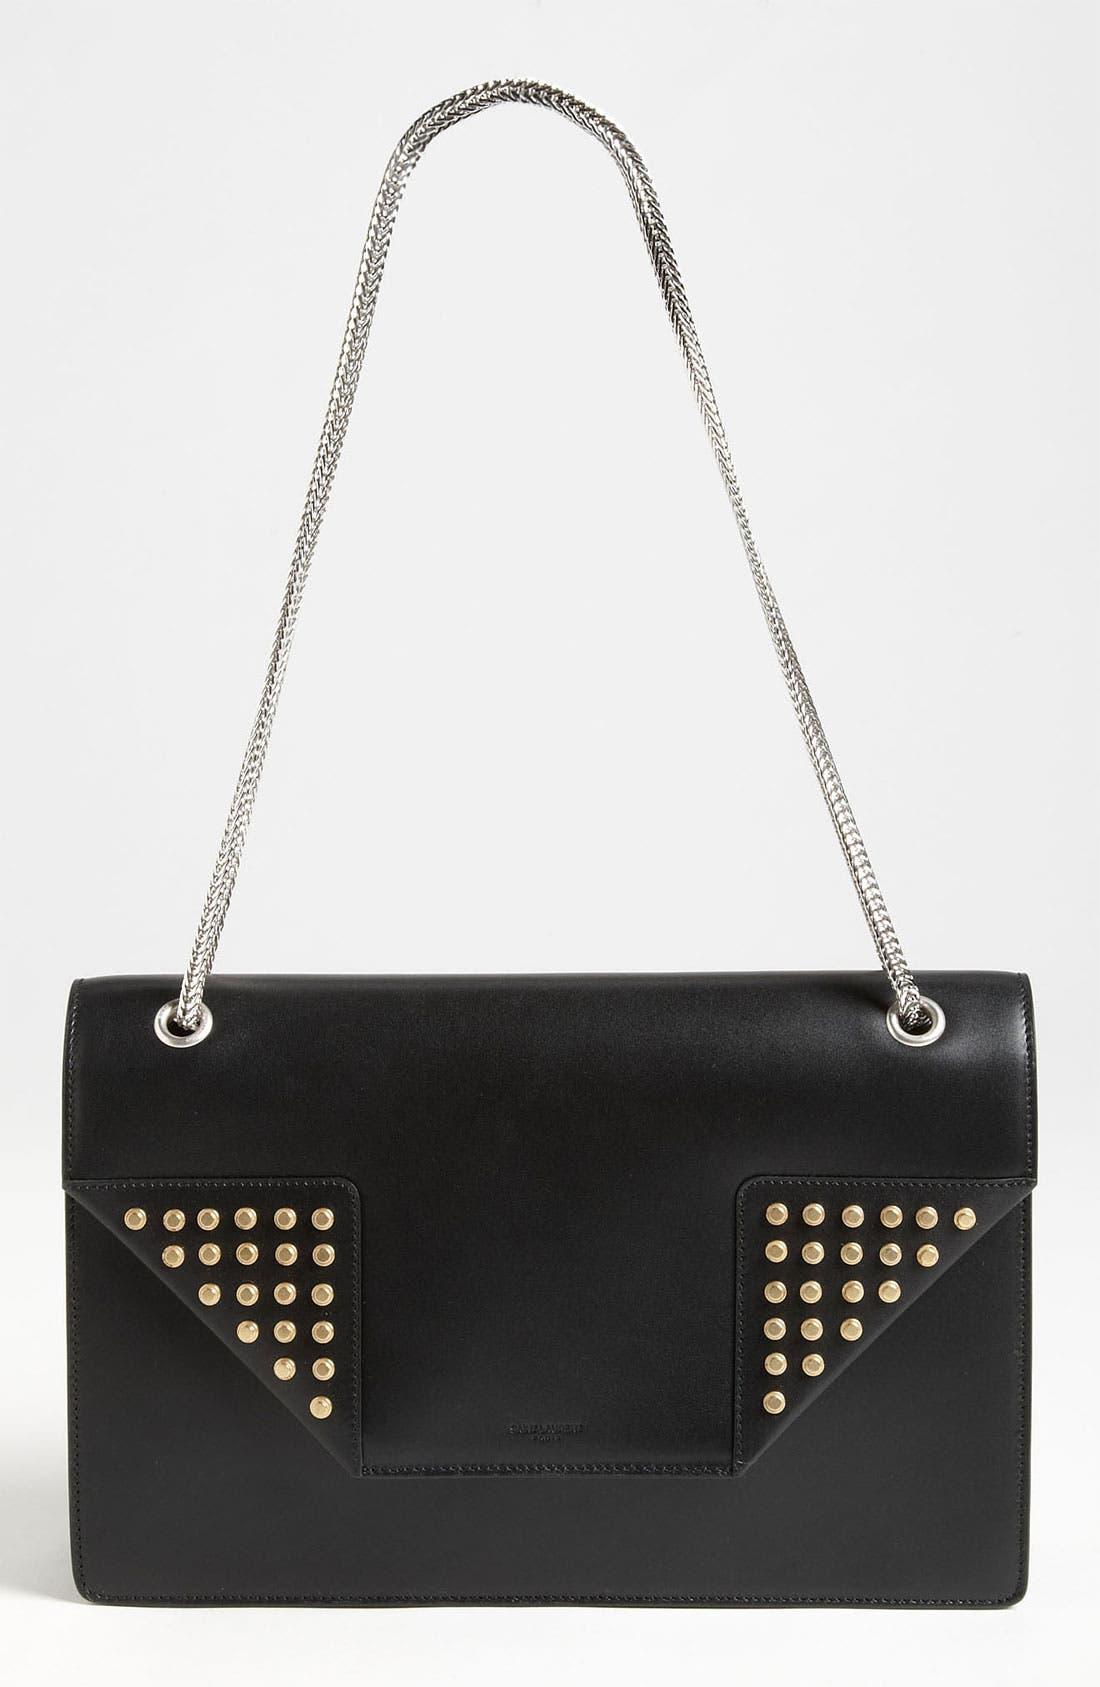 Main Image - Saint Laurent 'Betty - Medium' Shoulder Bag